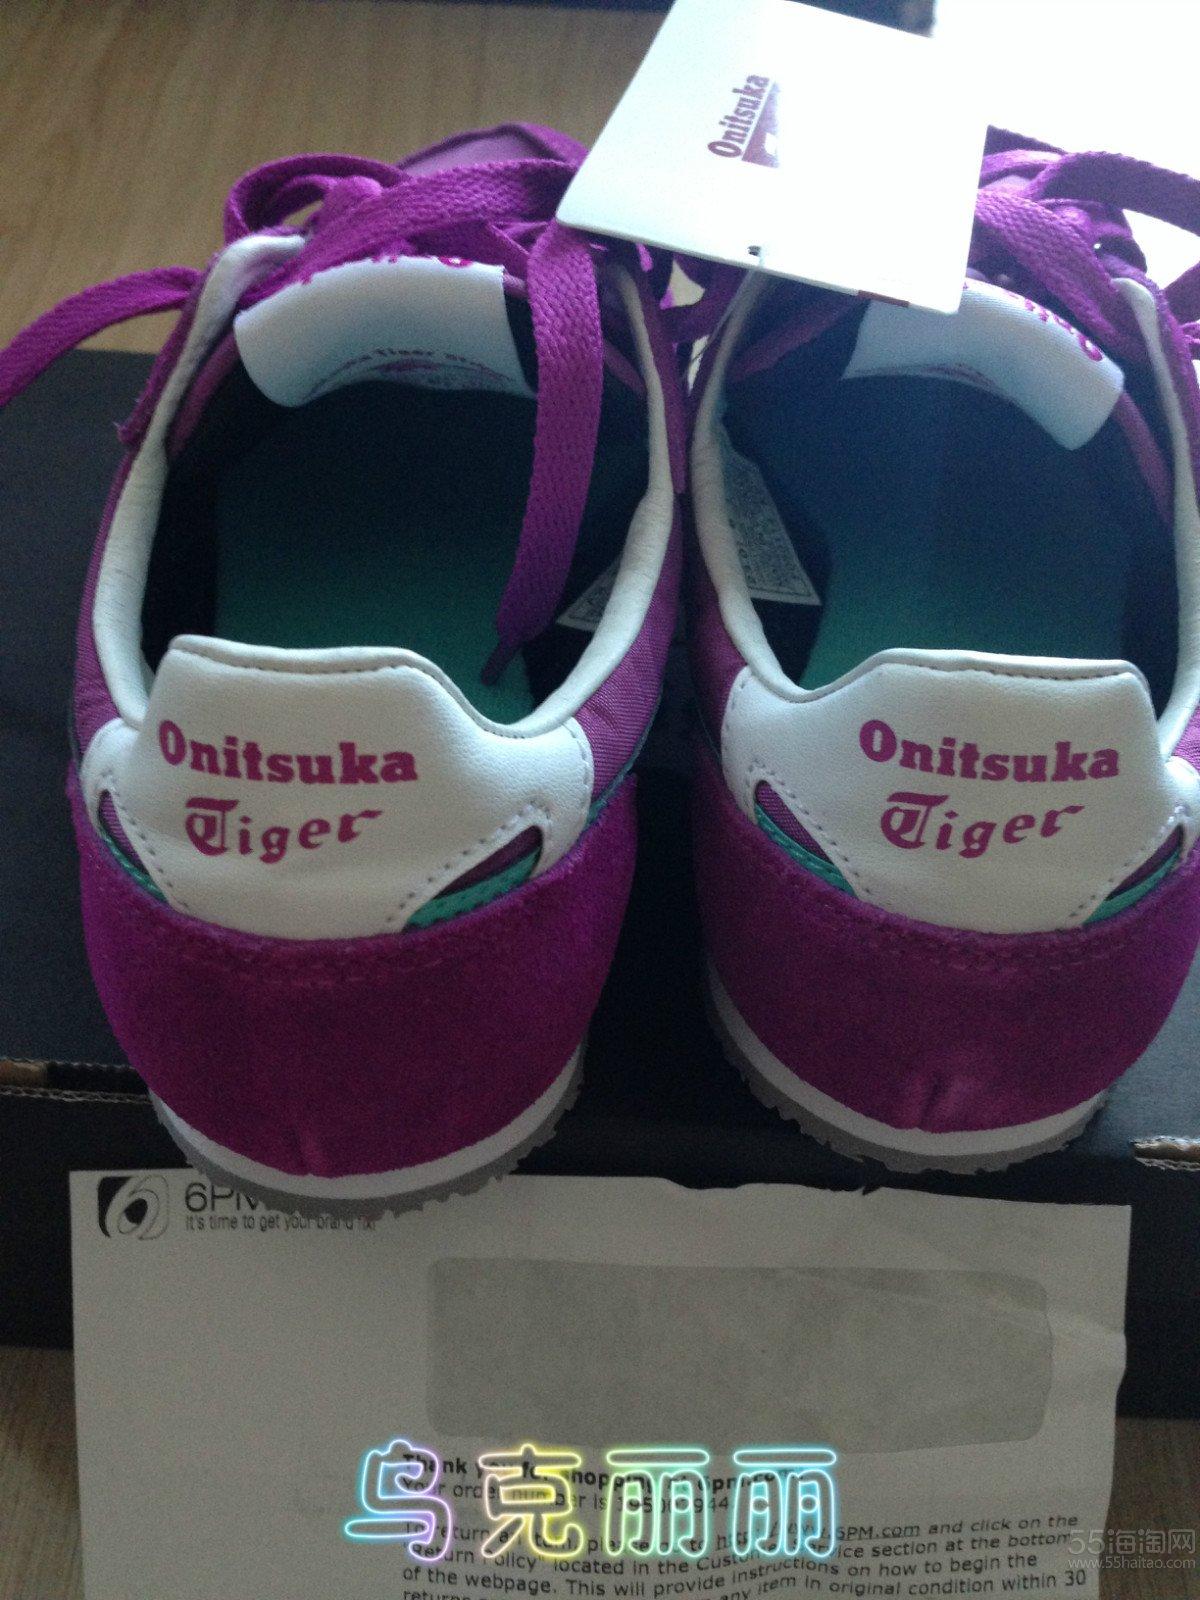 已出-亏本300元出一双全新Onitsuka Tiger 鬼冢虎鞋Onitsuka Tiger by Asics Serrano™超轻跑鞋